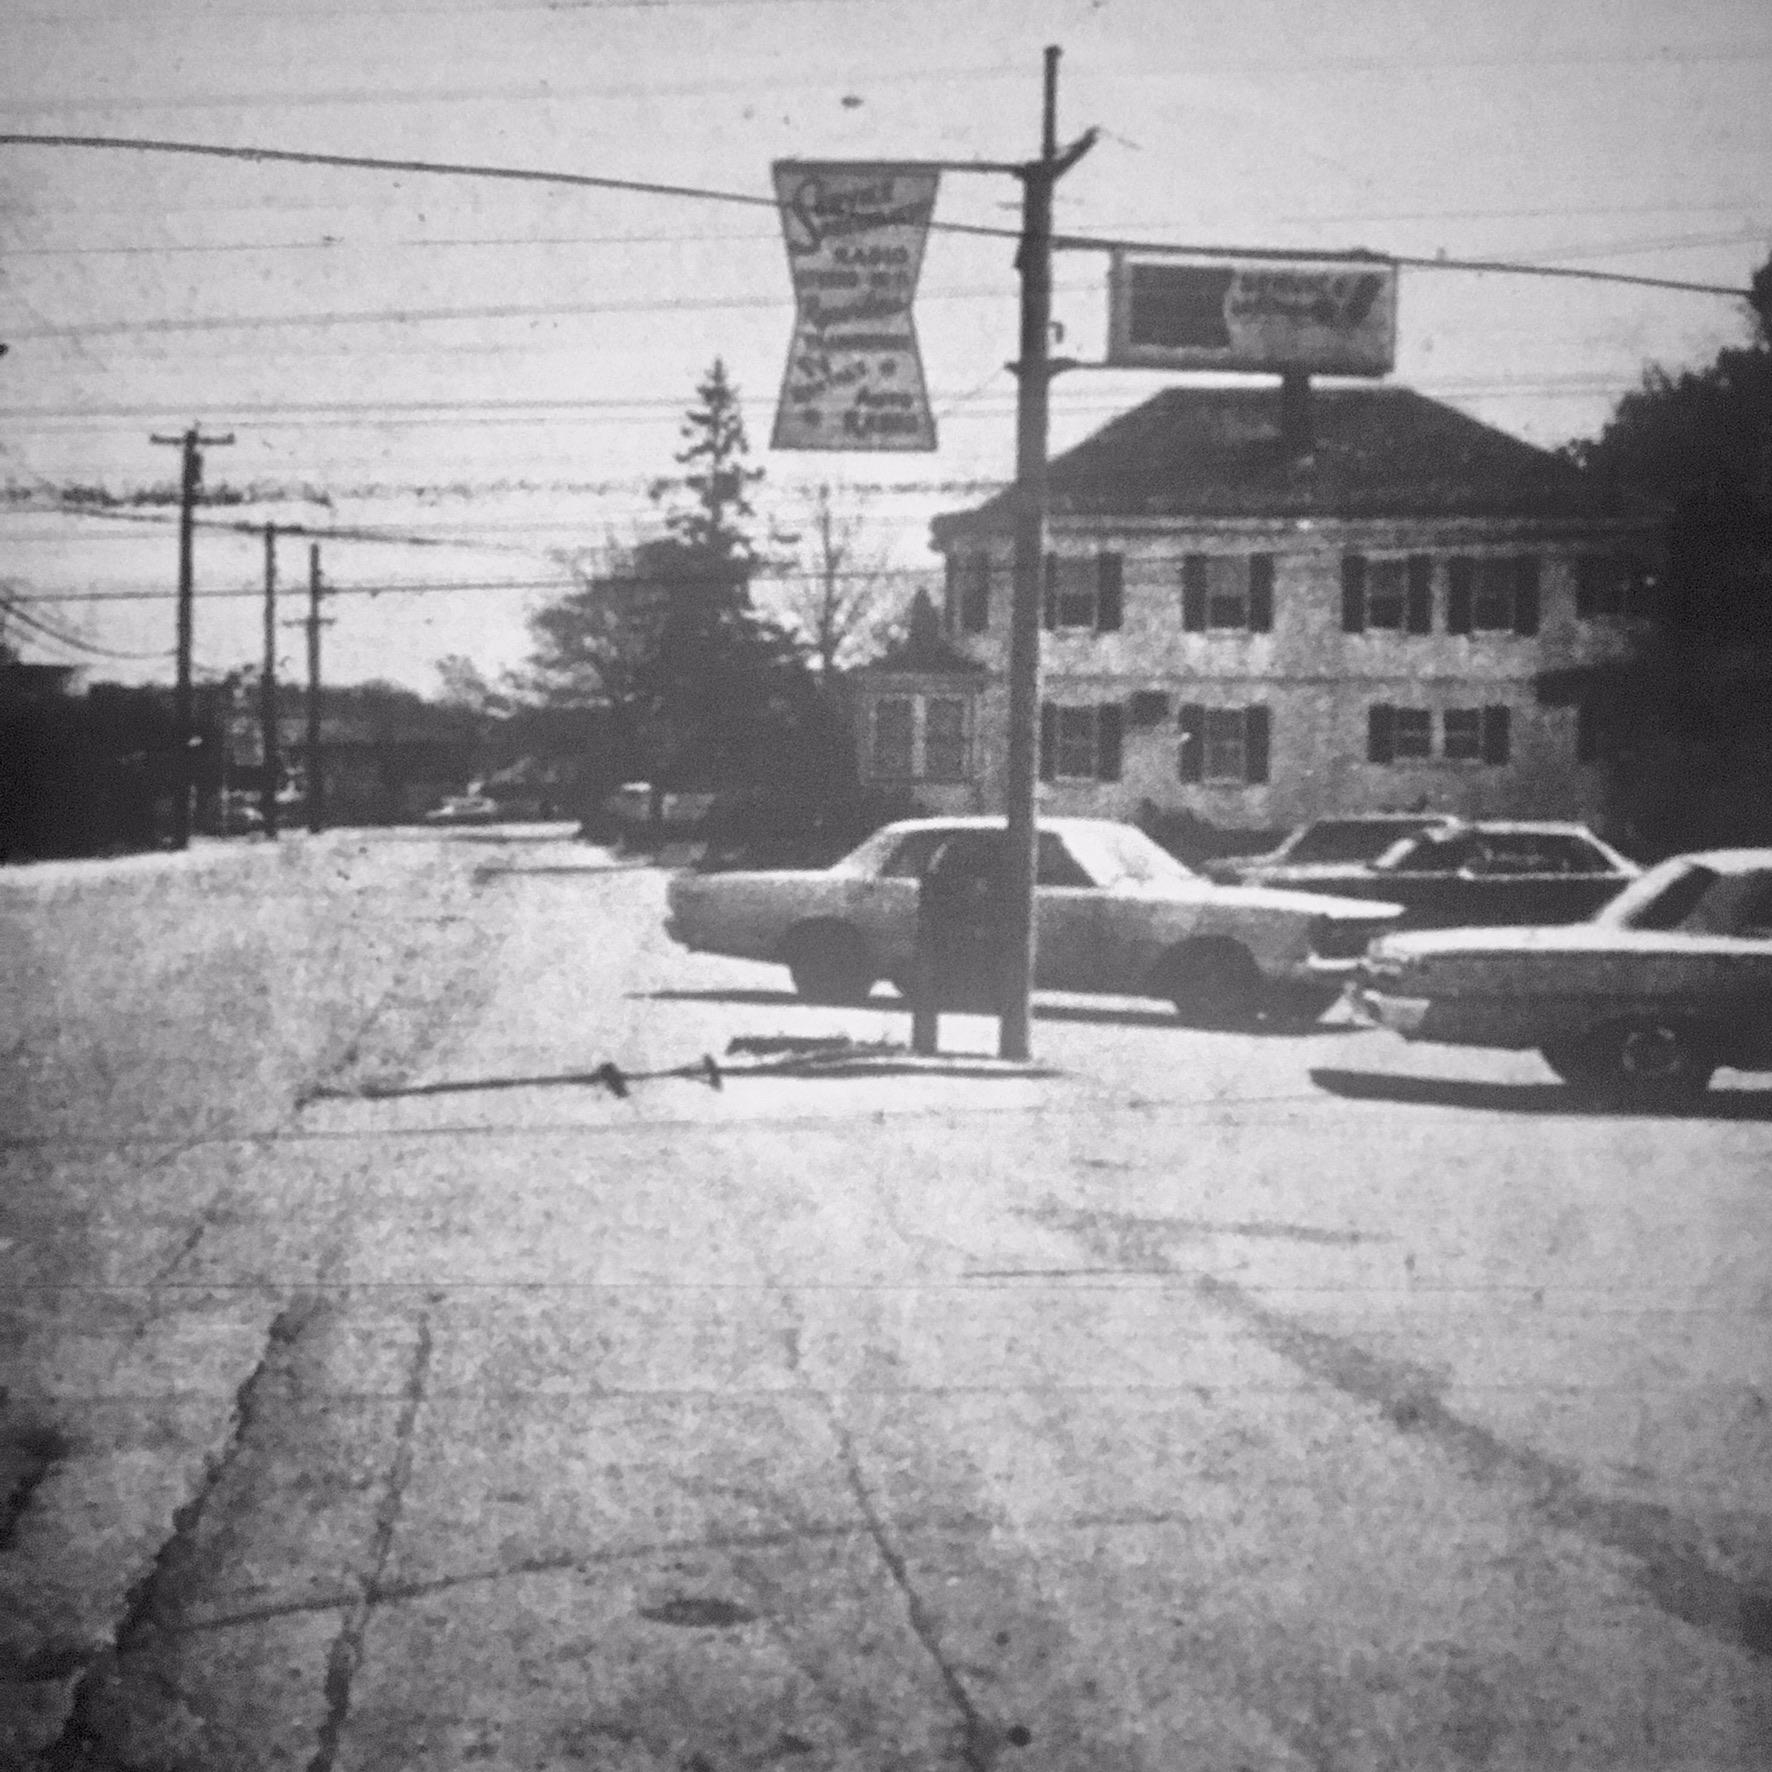 Winnmere, mid 1960s